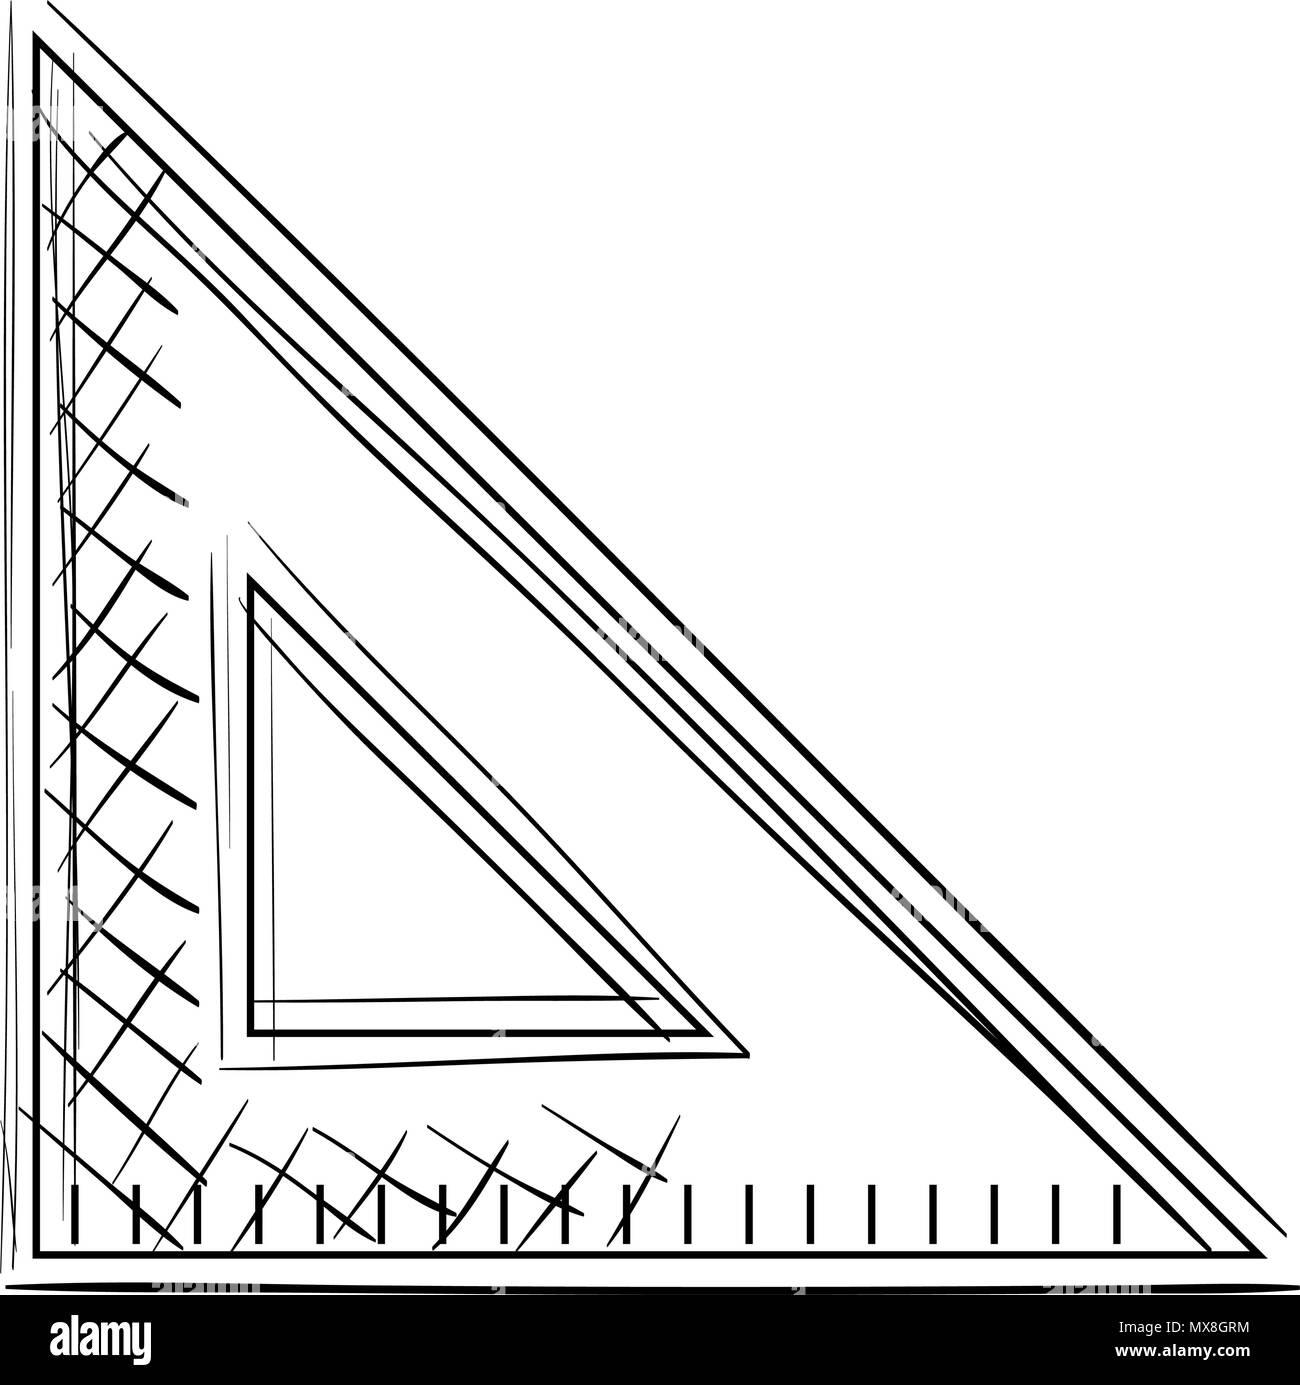 triangular geometric rule school - Stock Image